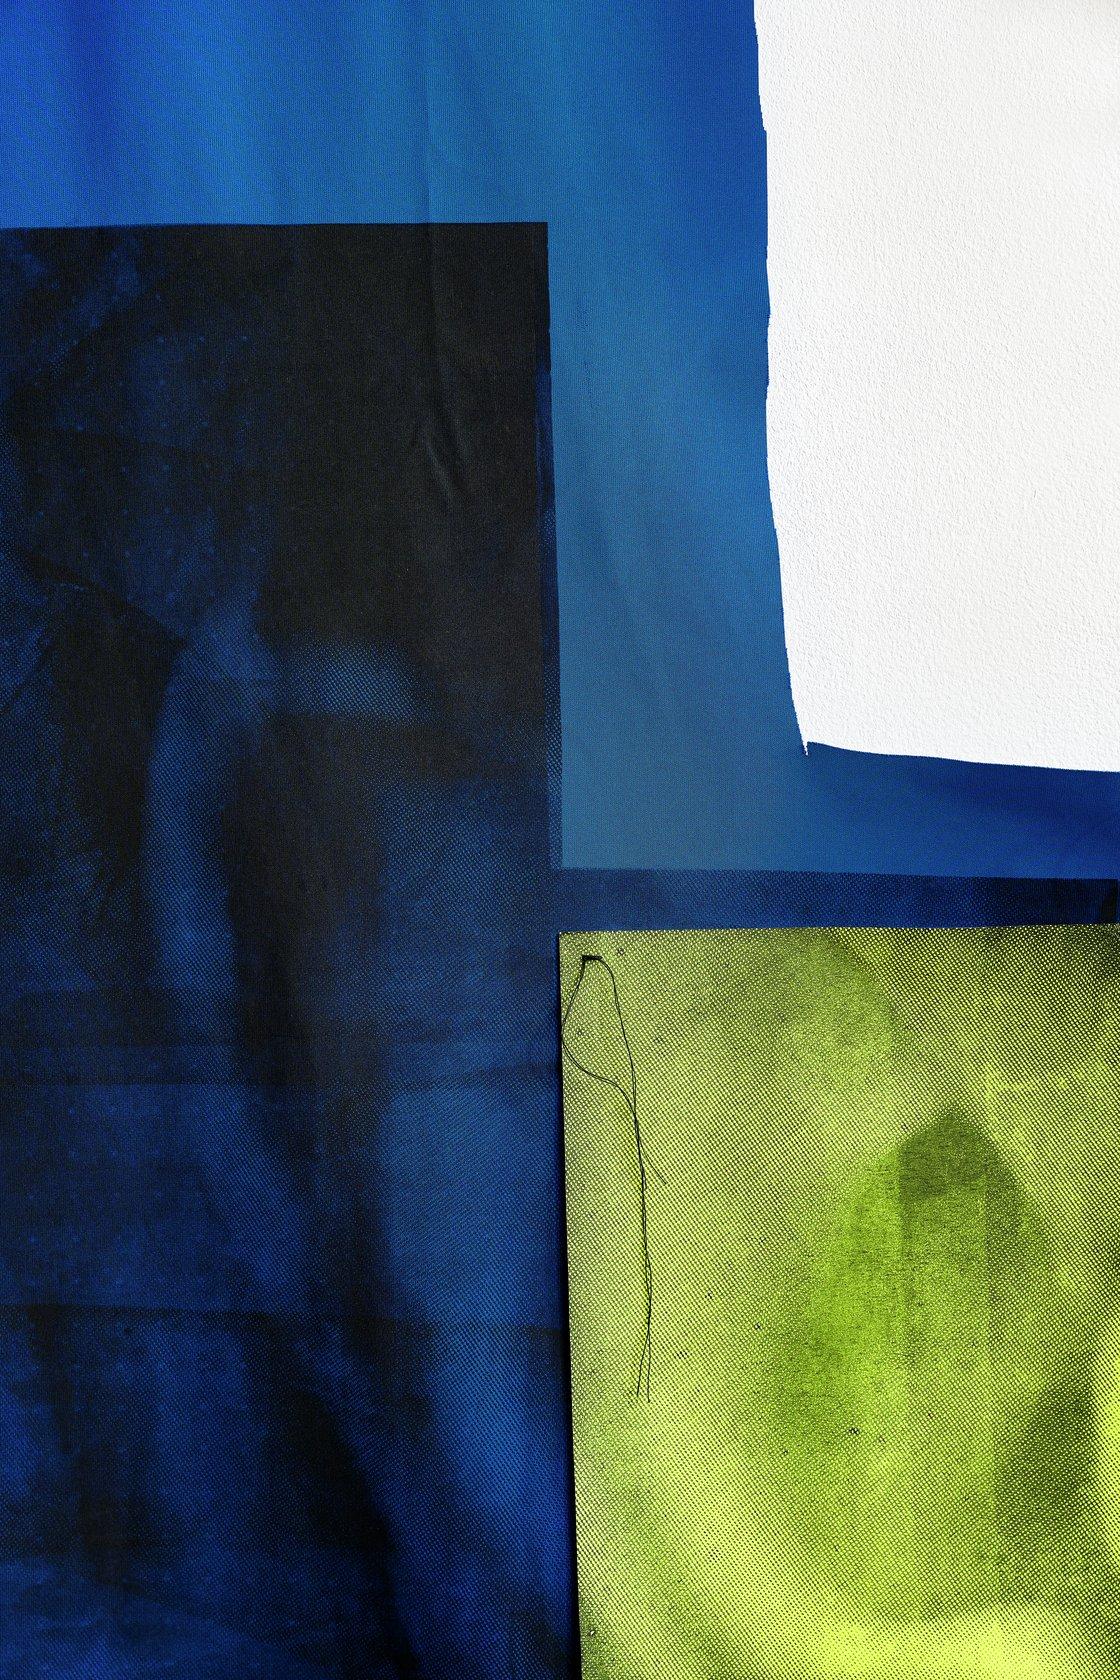 David Douard, Untitled , 2020